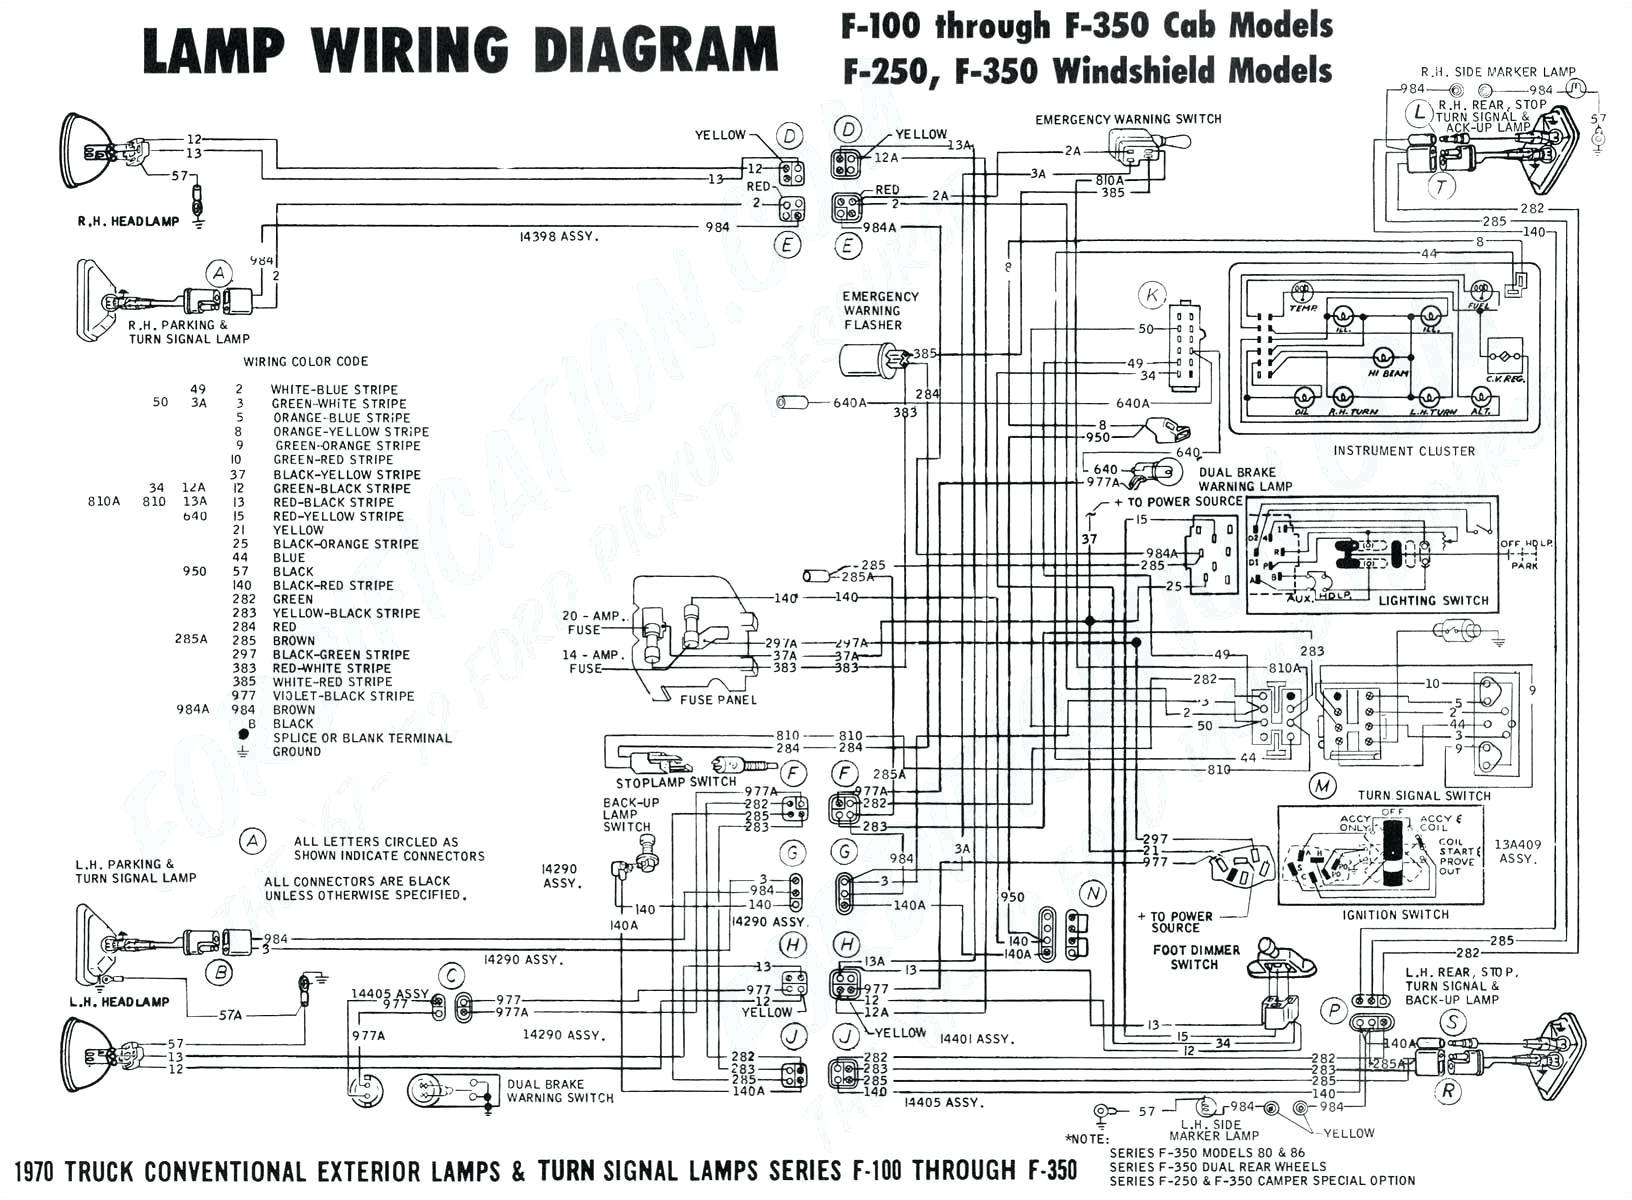 2005 ford explorer fuse box location wiring diagram toolbox 05 explorer fuse diagram wiring diagram paper